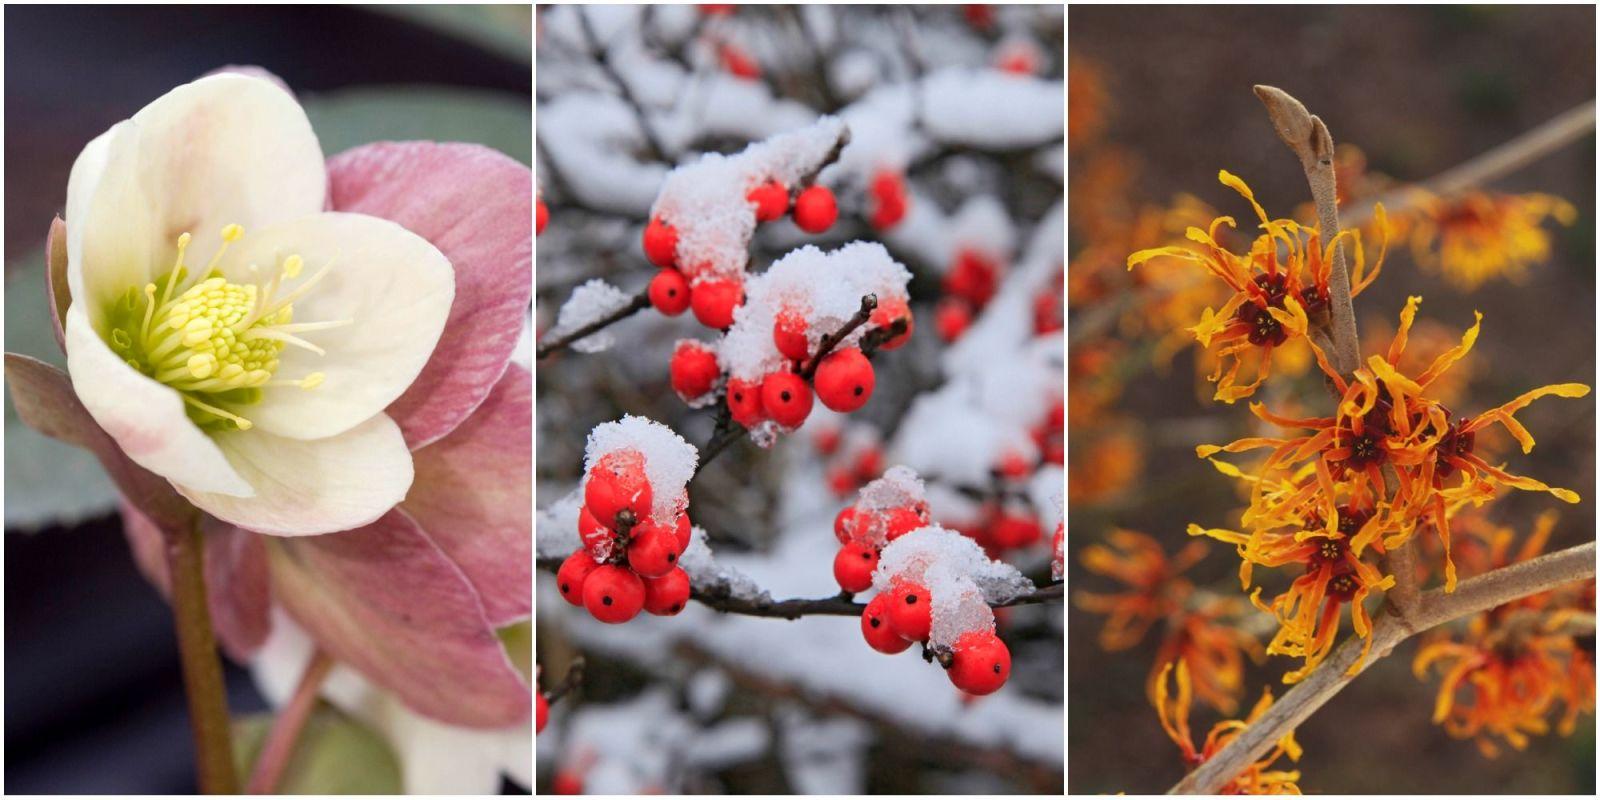 Flowers that bloom in winter months - Flowers That Bloom In Winter Months 23